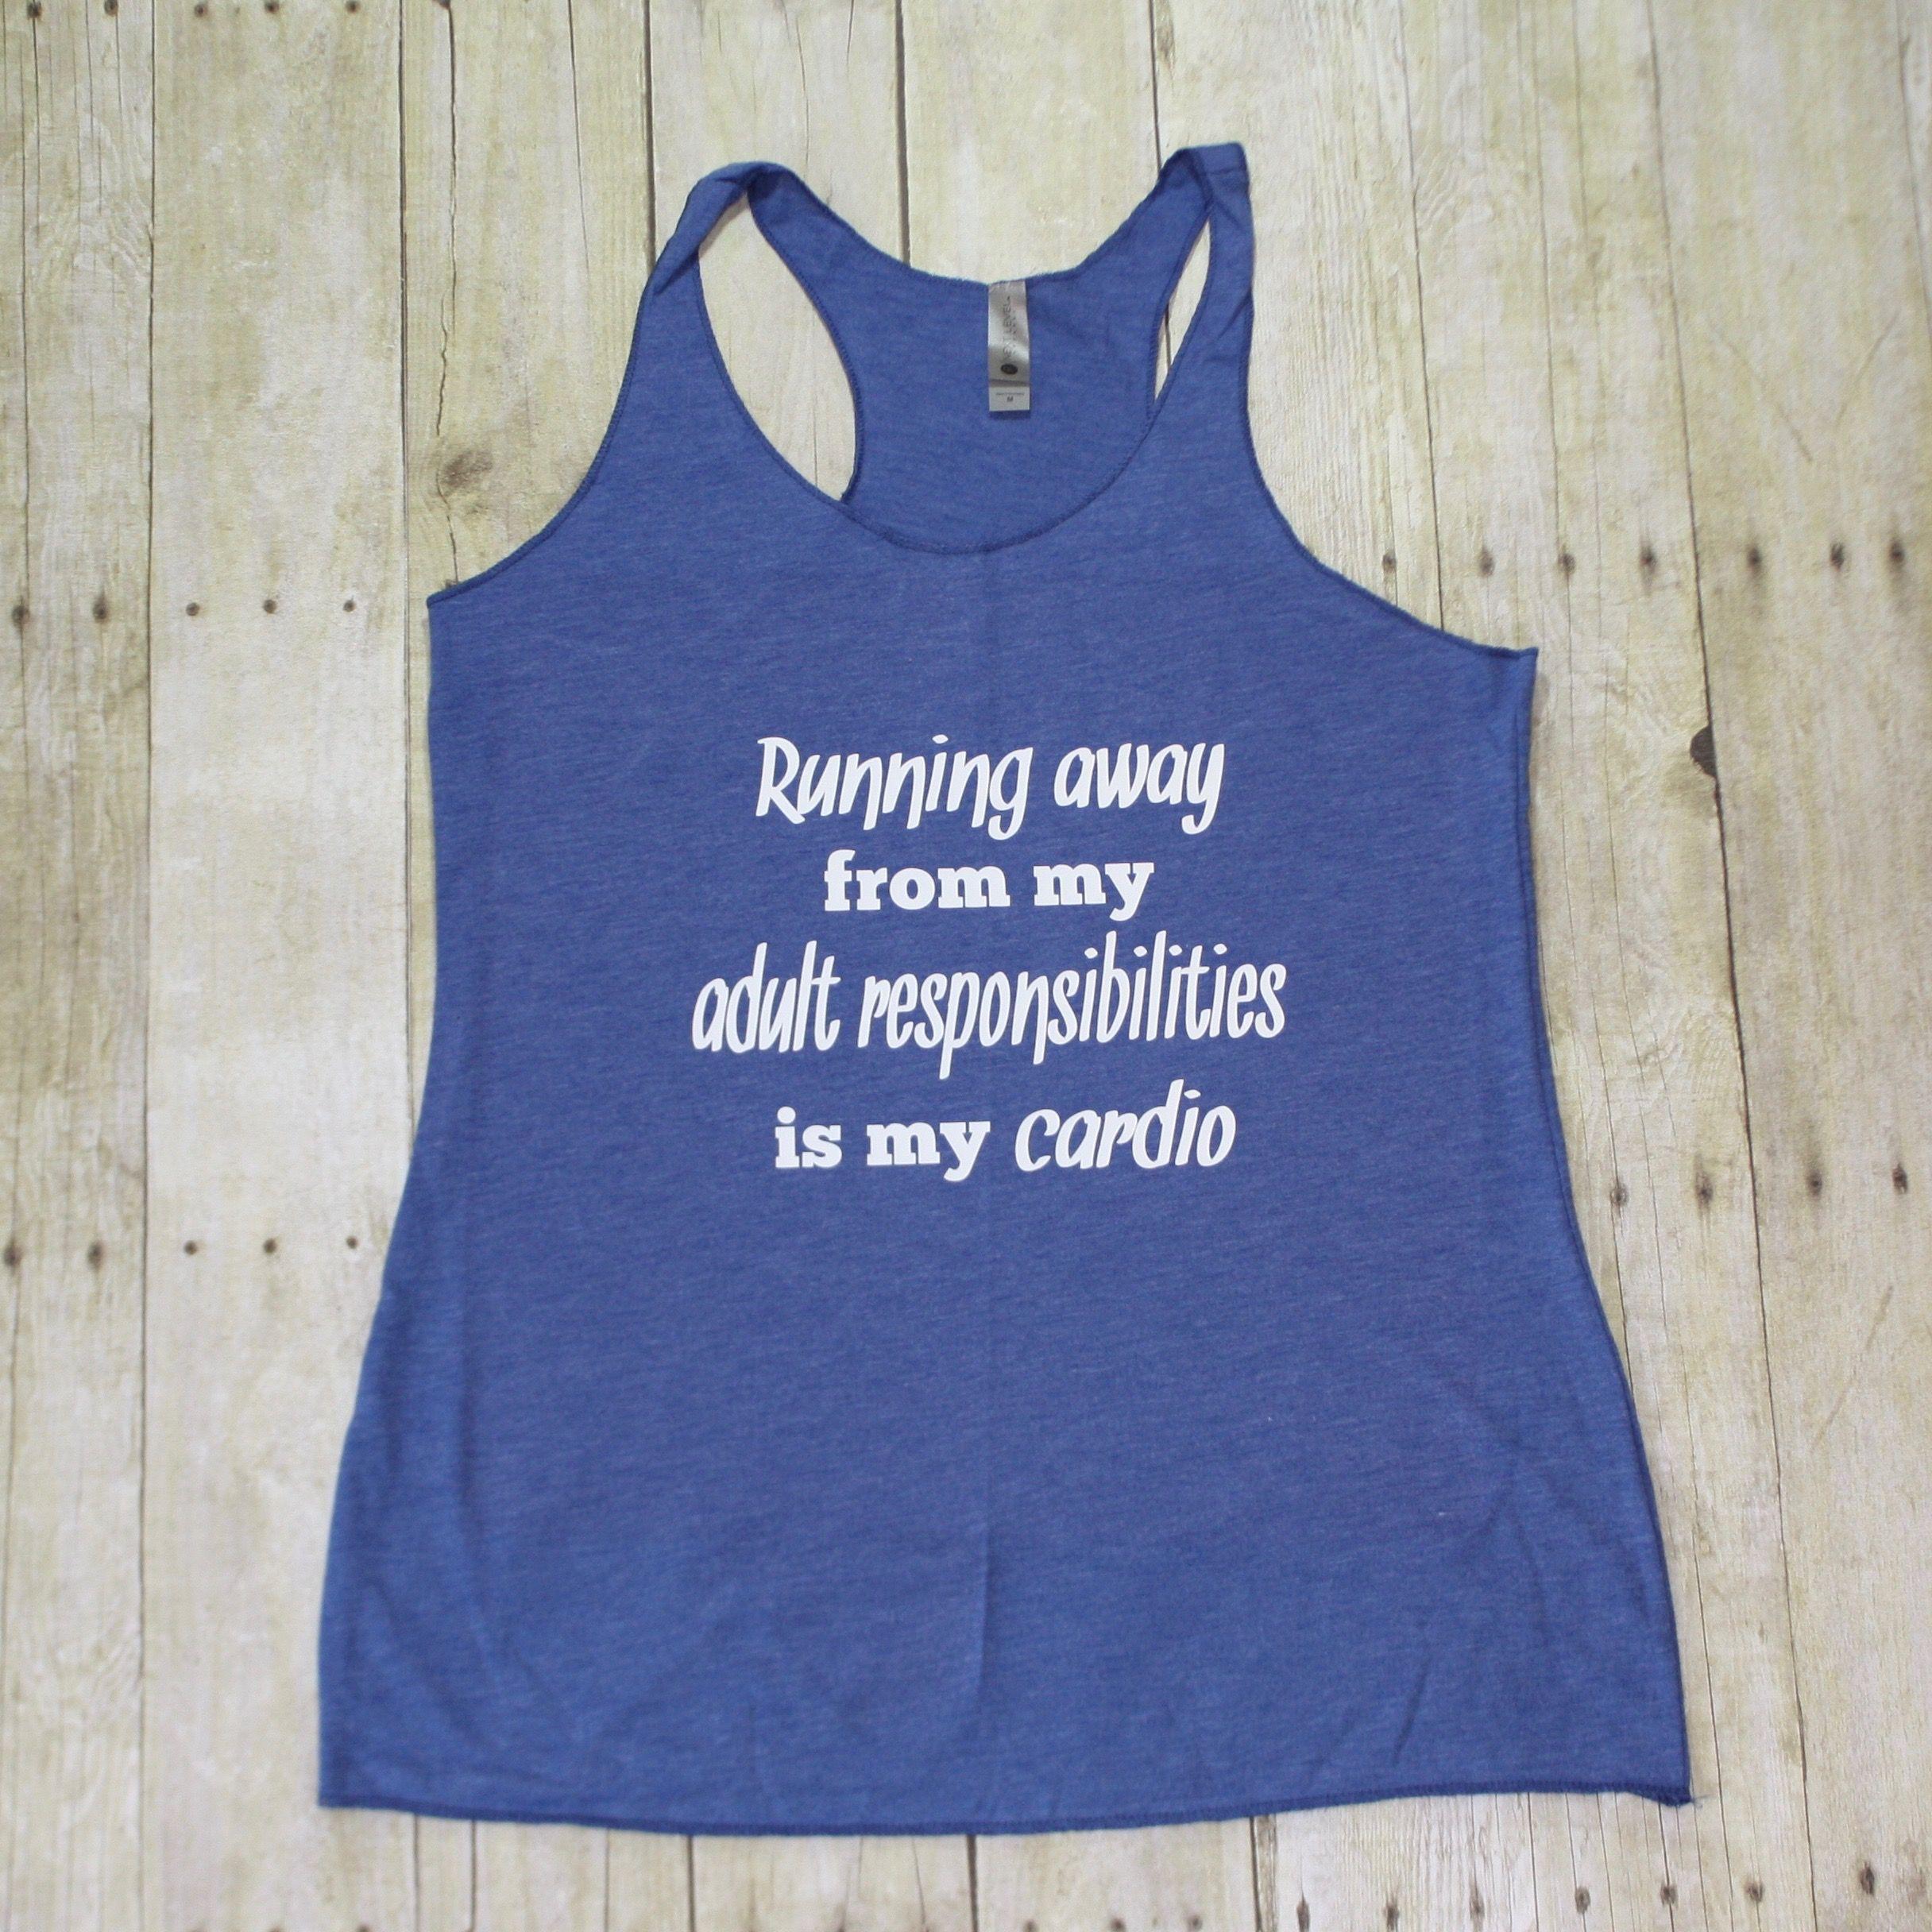 d37222a87c9cc8 Women s workout tank